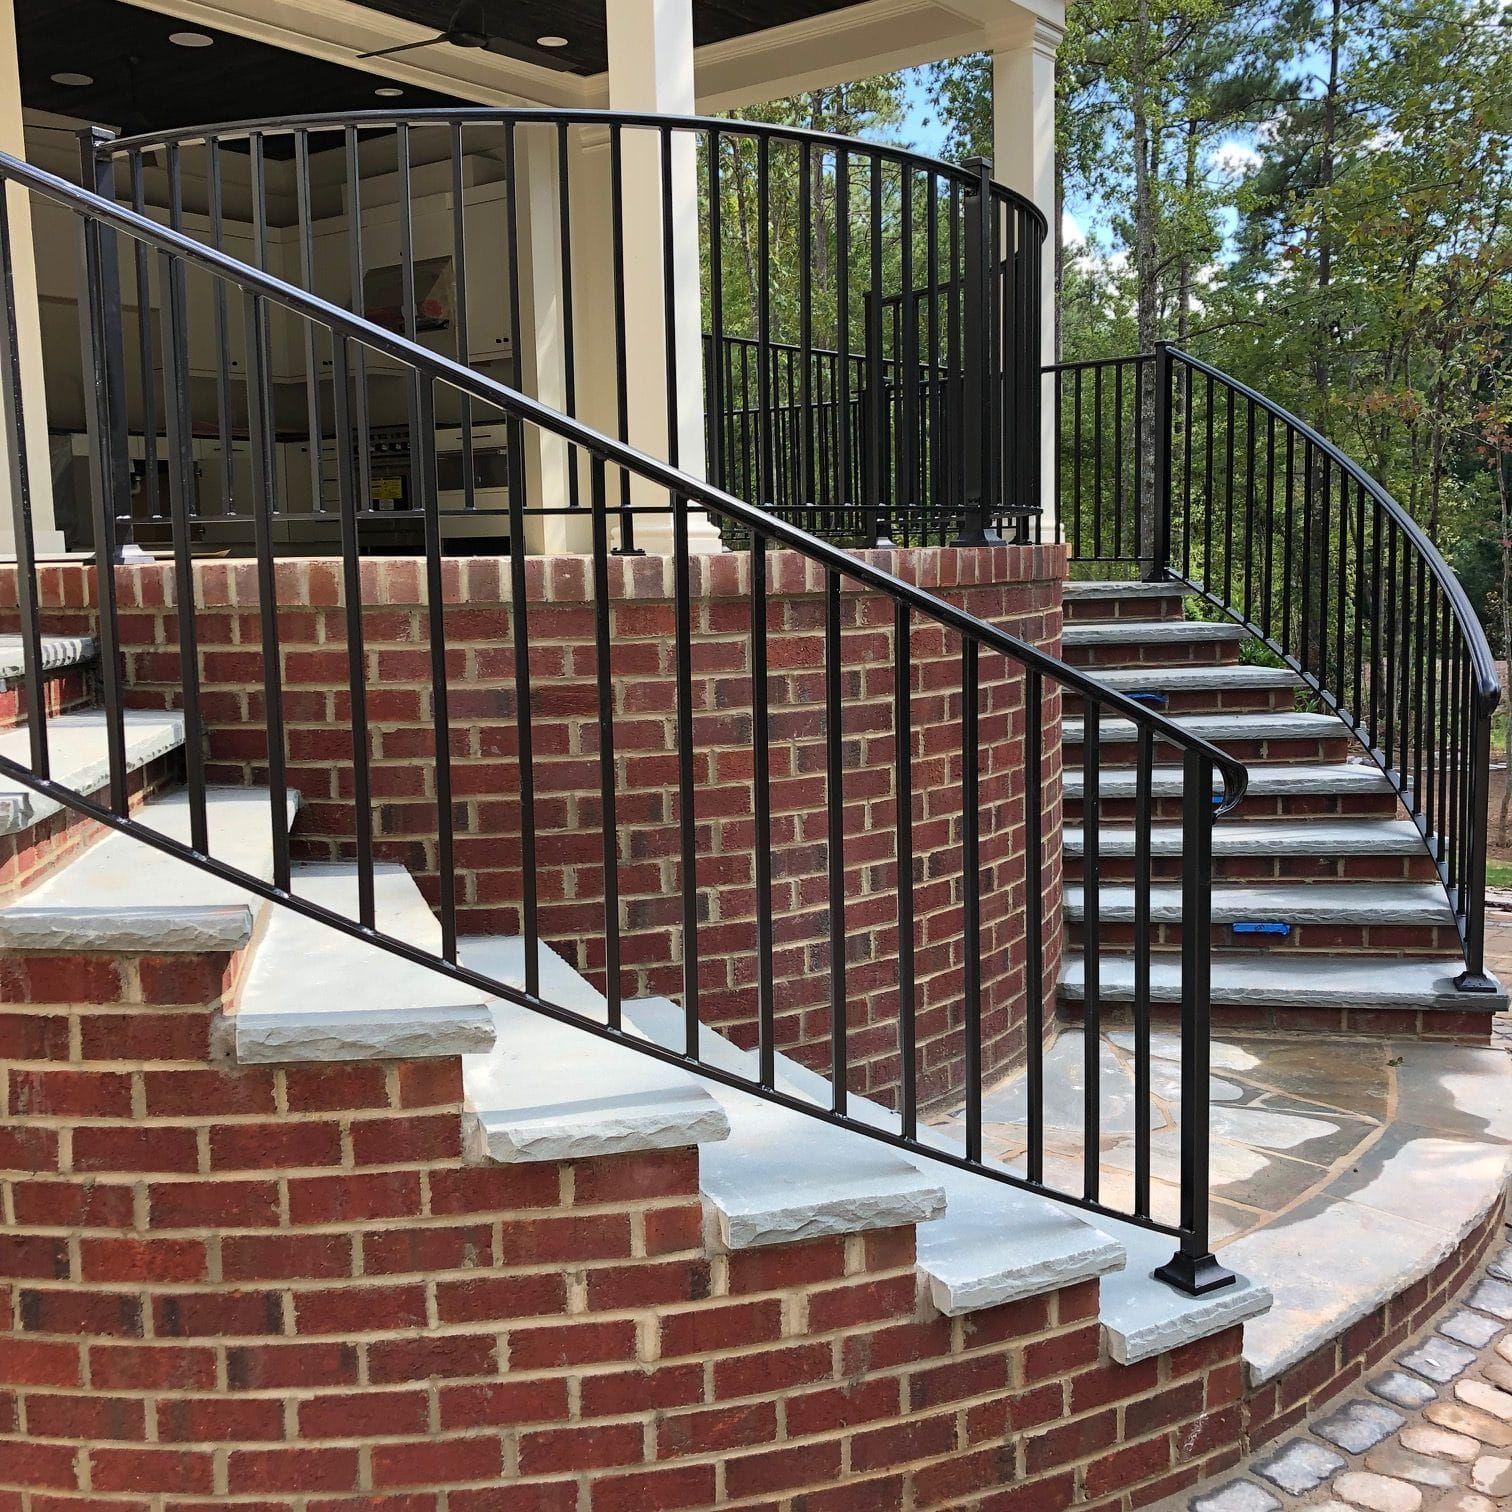 Exterior Residential Iron Railings | Iron railing ...